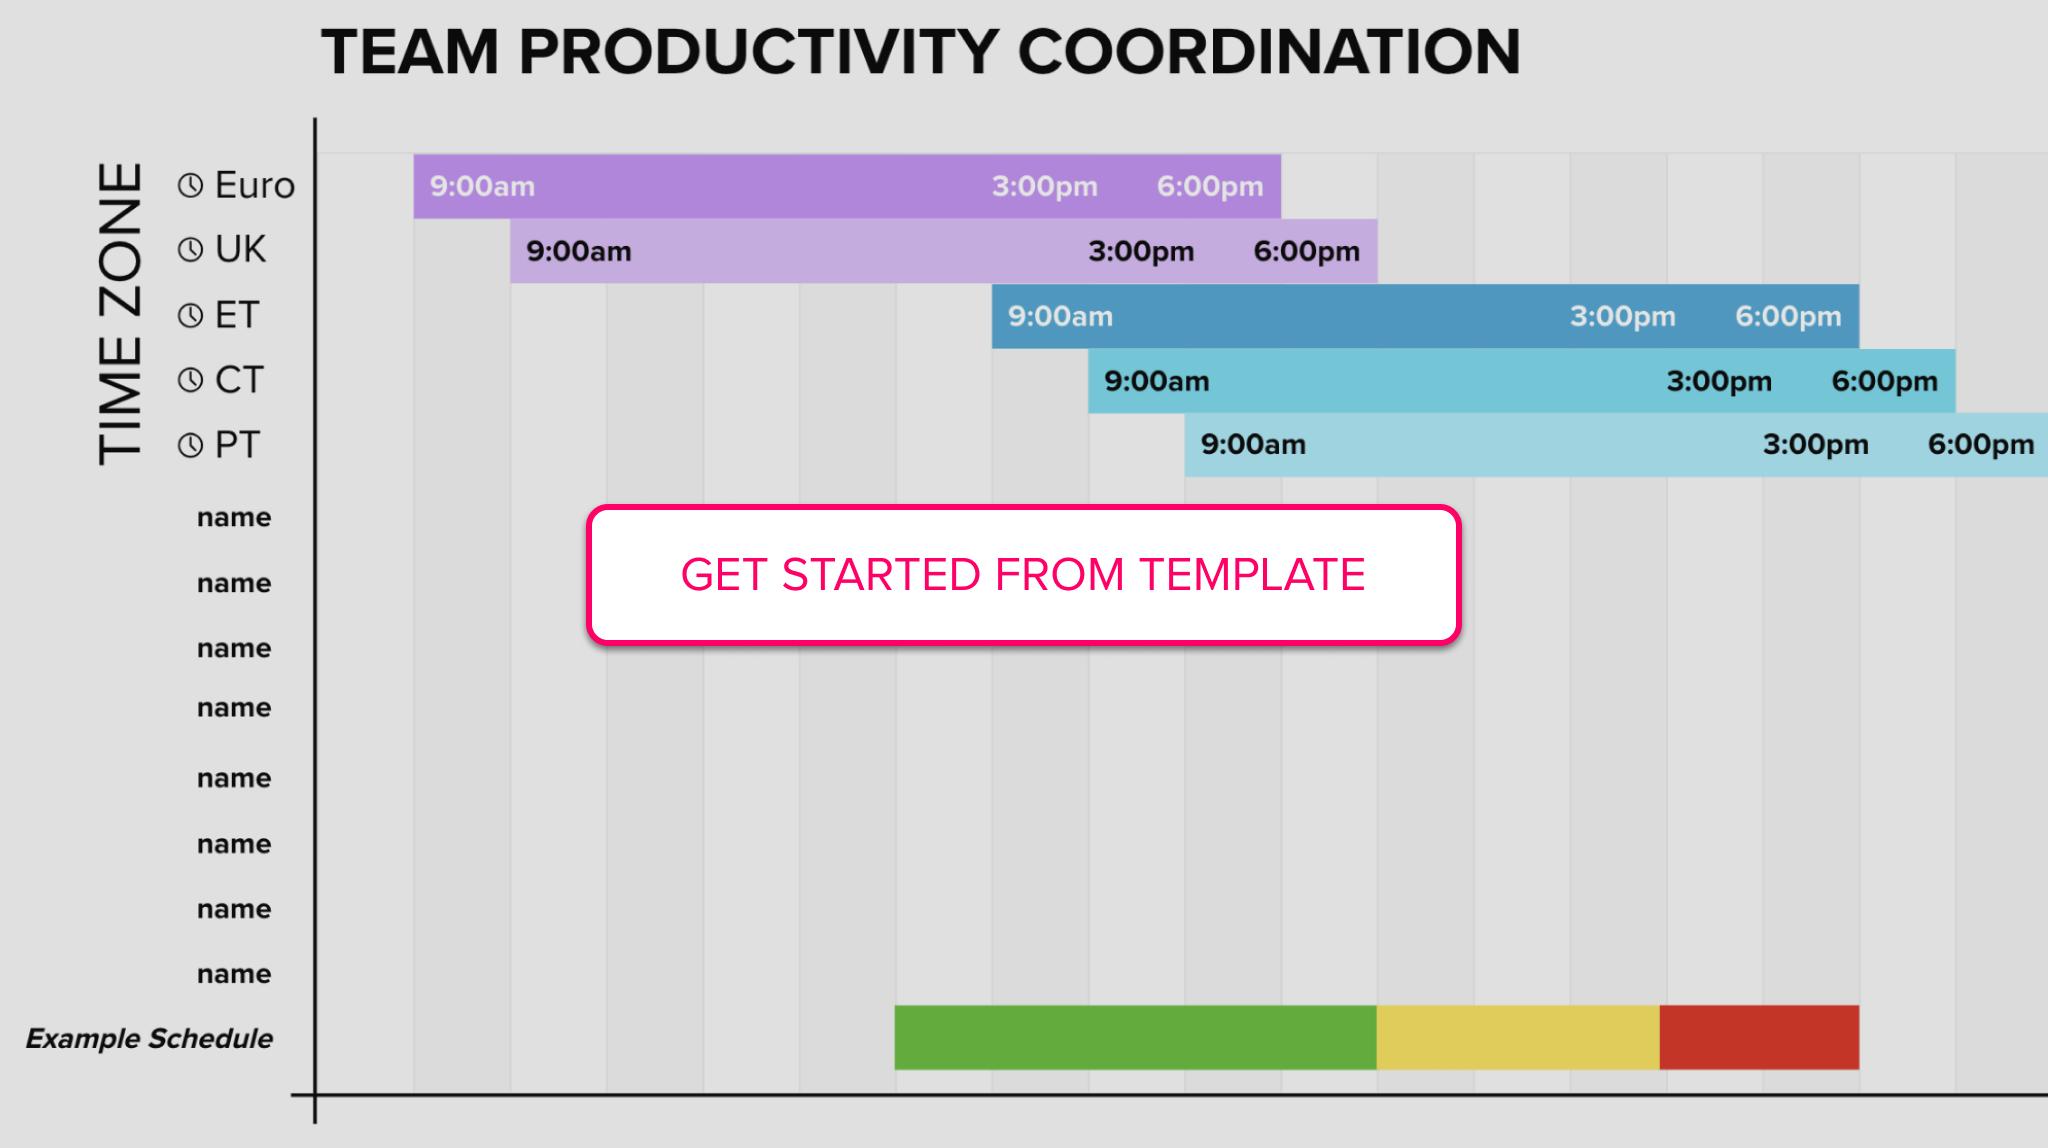 Team productivity coordination template